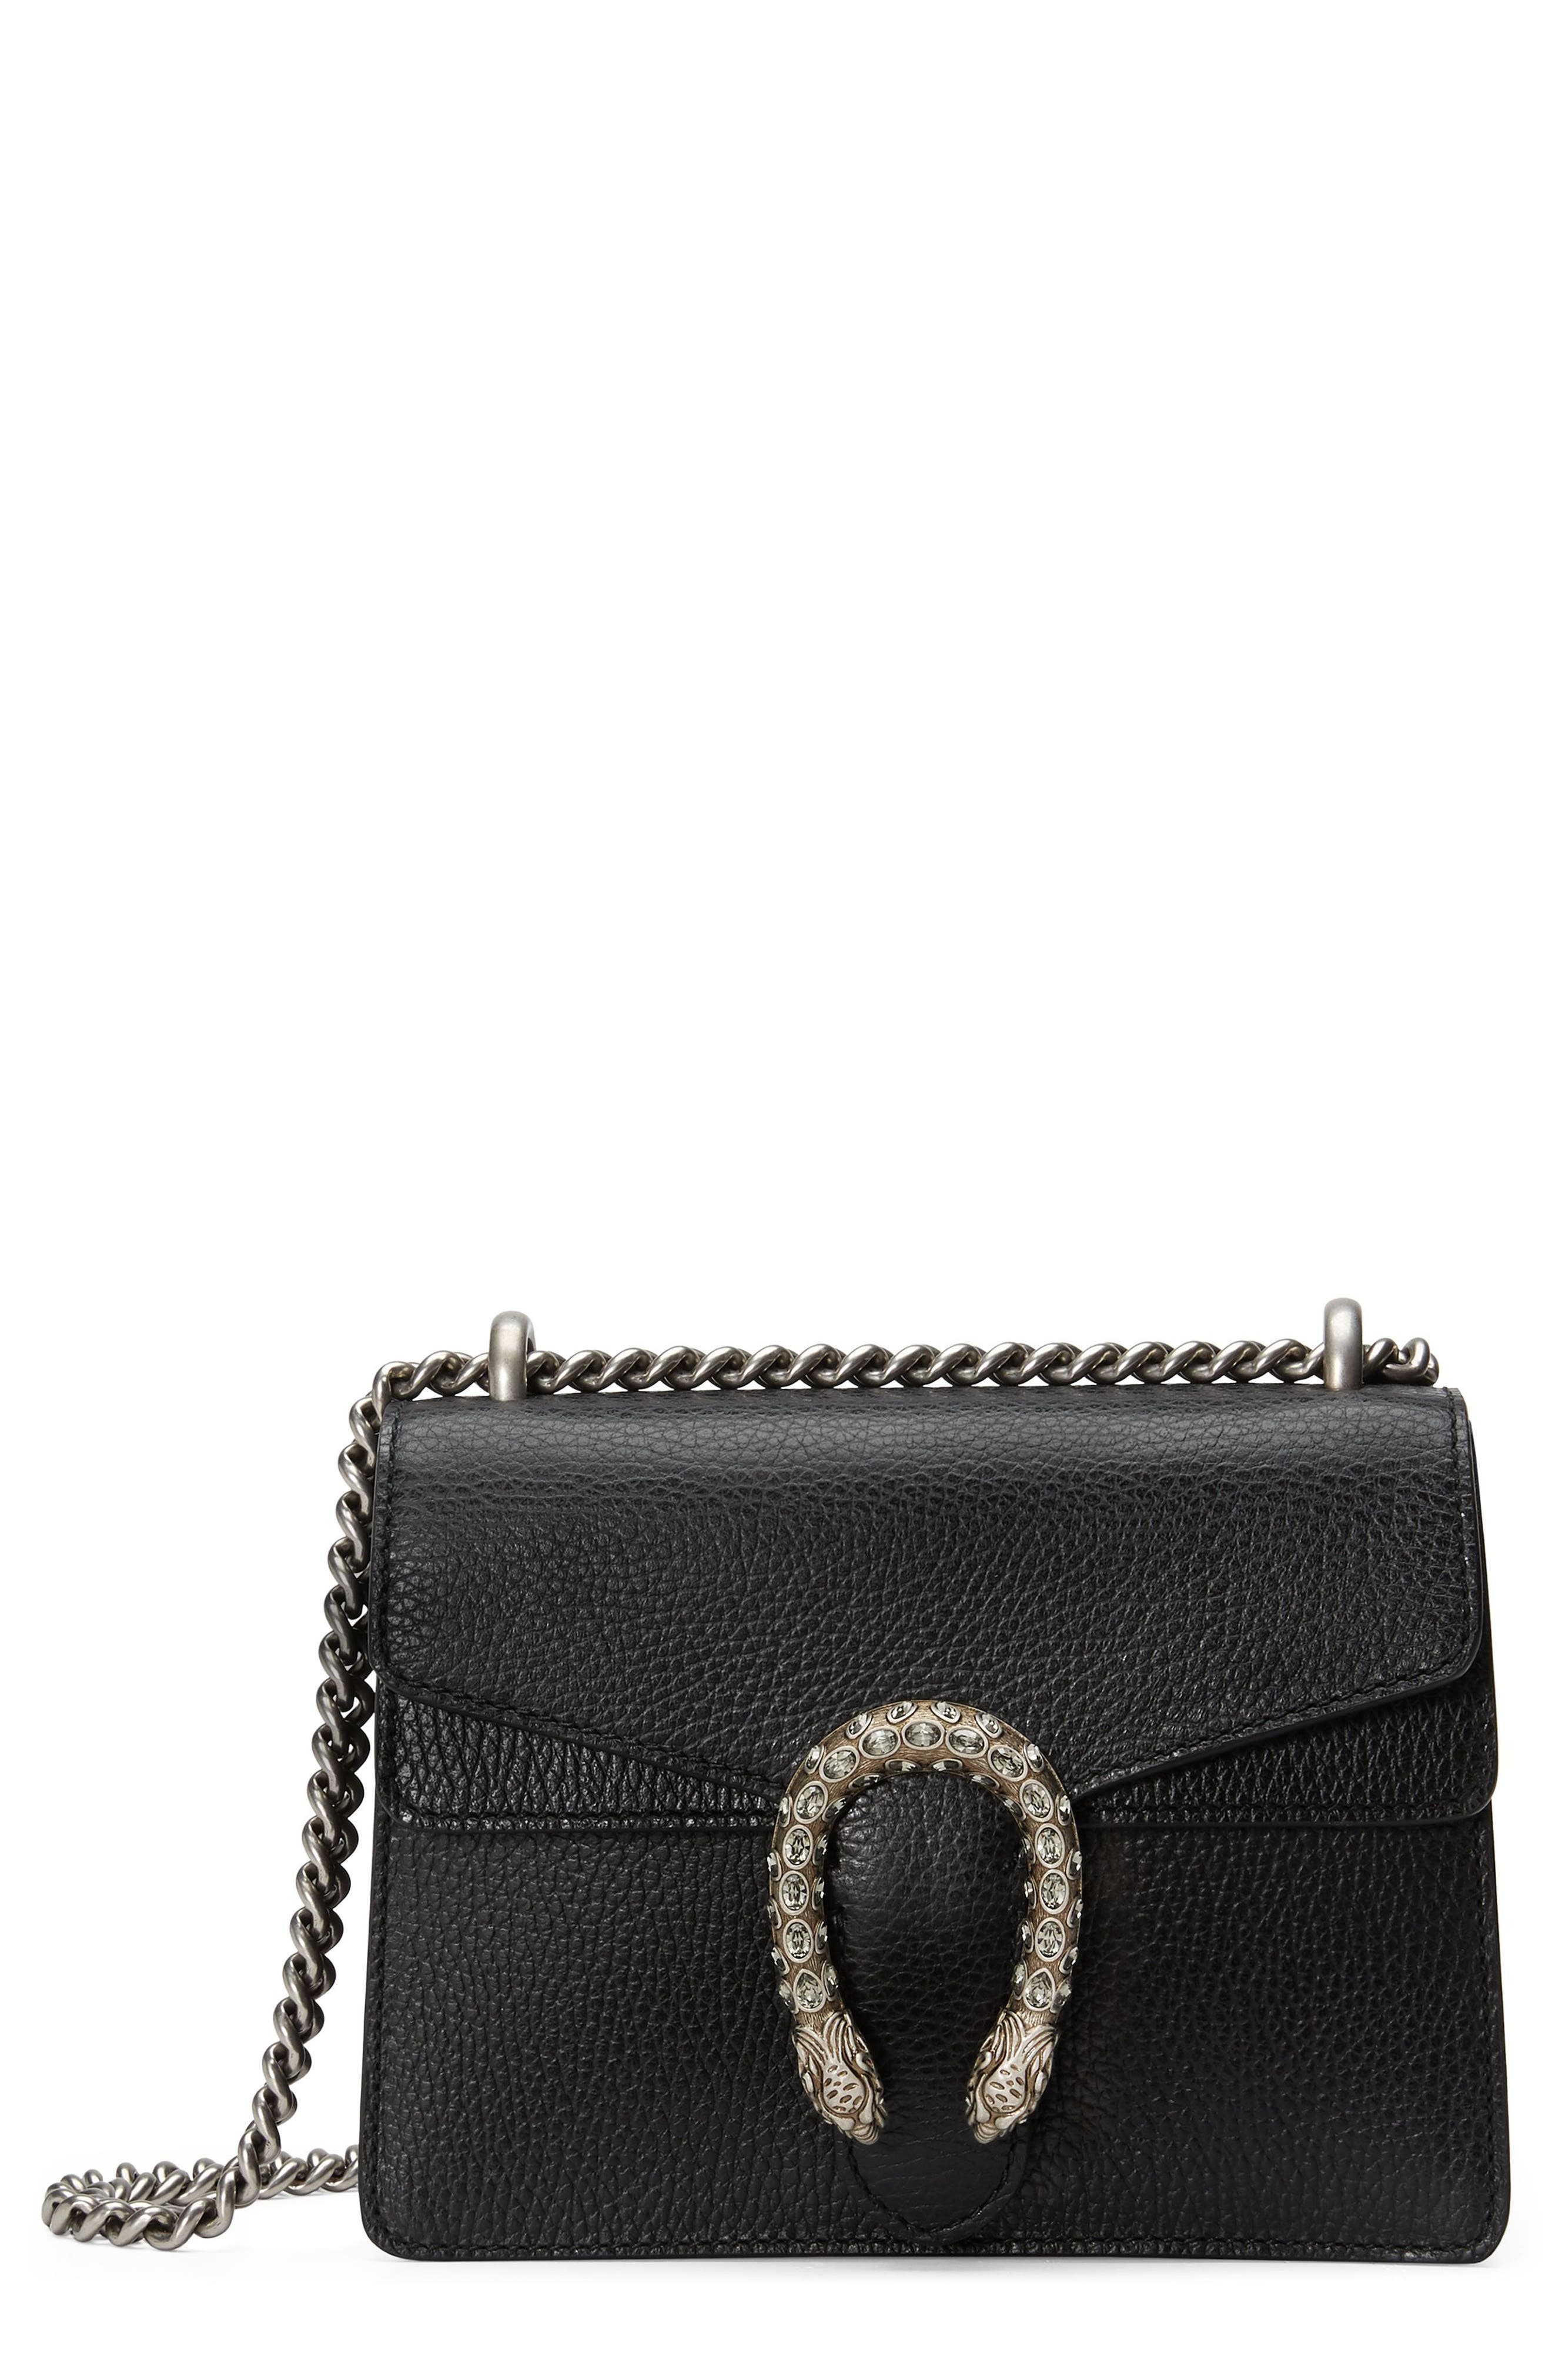 Mini Dionysus Leather Shoulder Bag,                             Main thumbnail 1, color,                             NERO/ BLACK DIAMOND